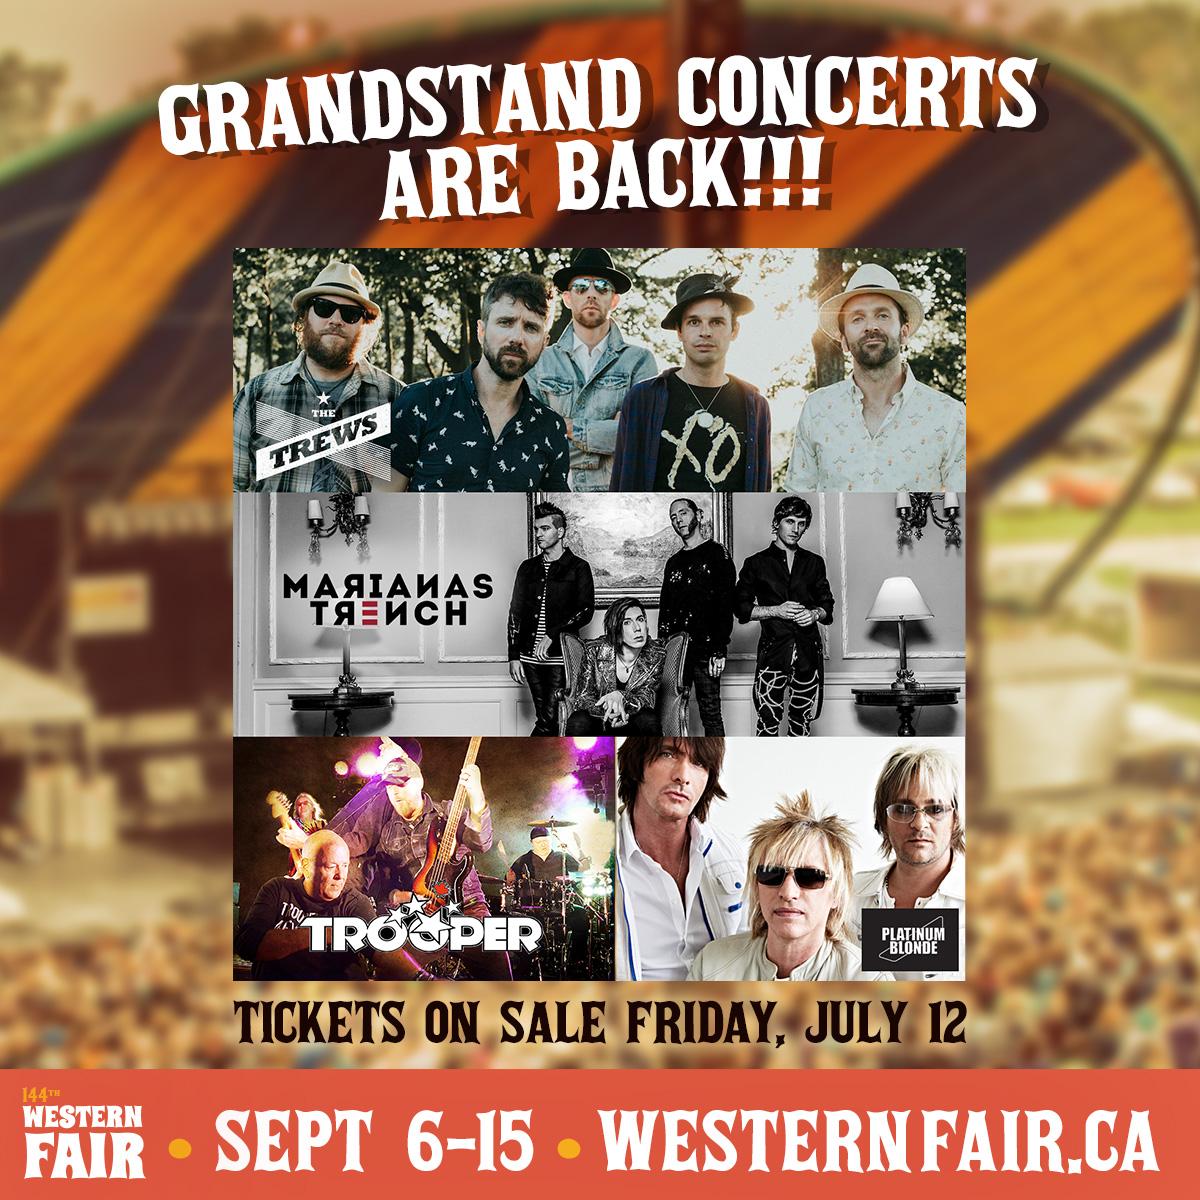 Grandstand Concerts